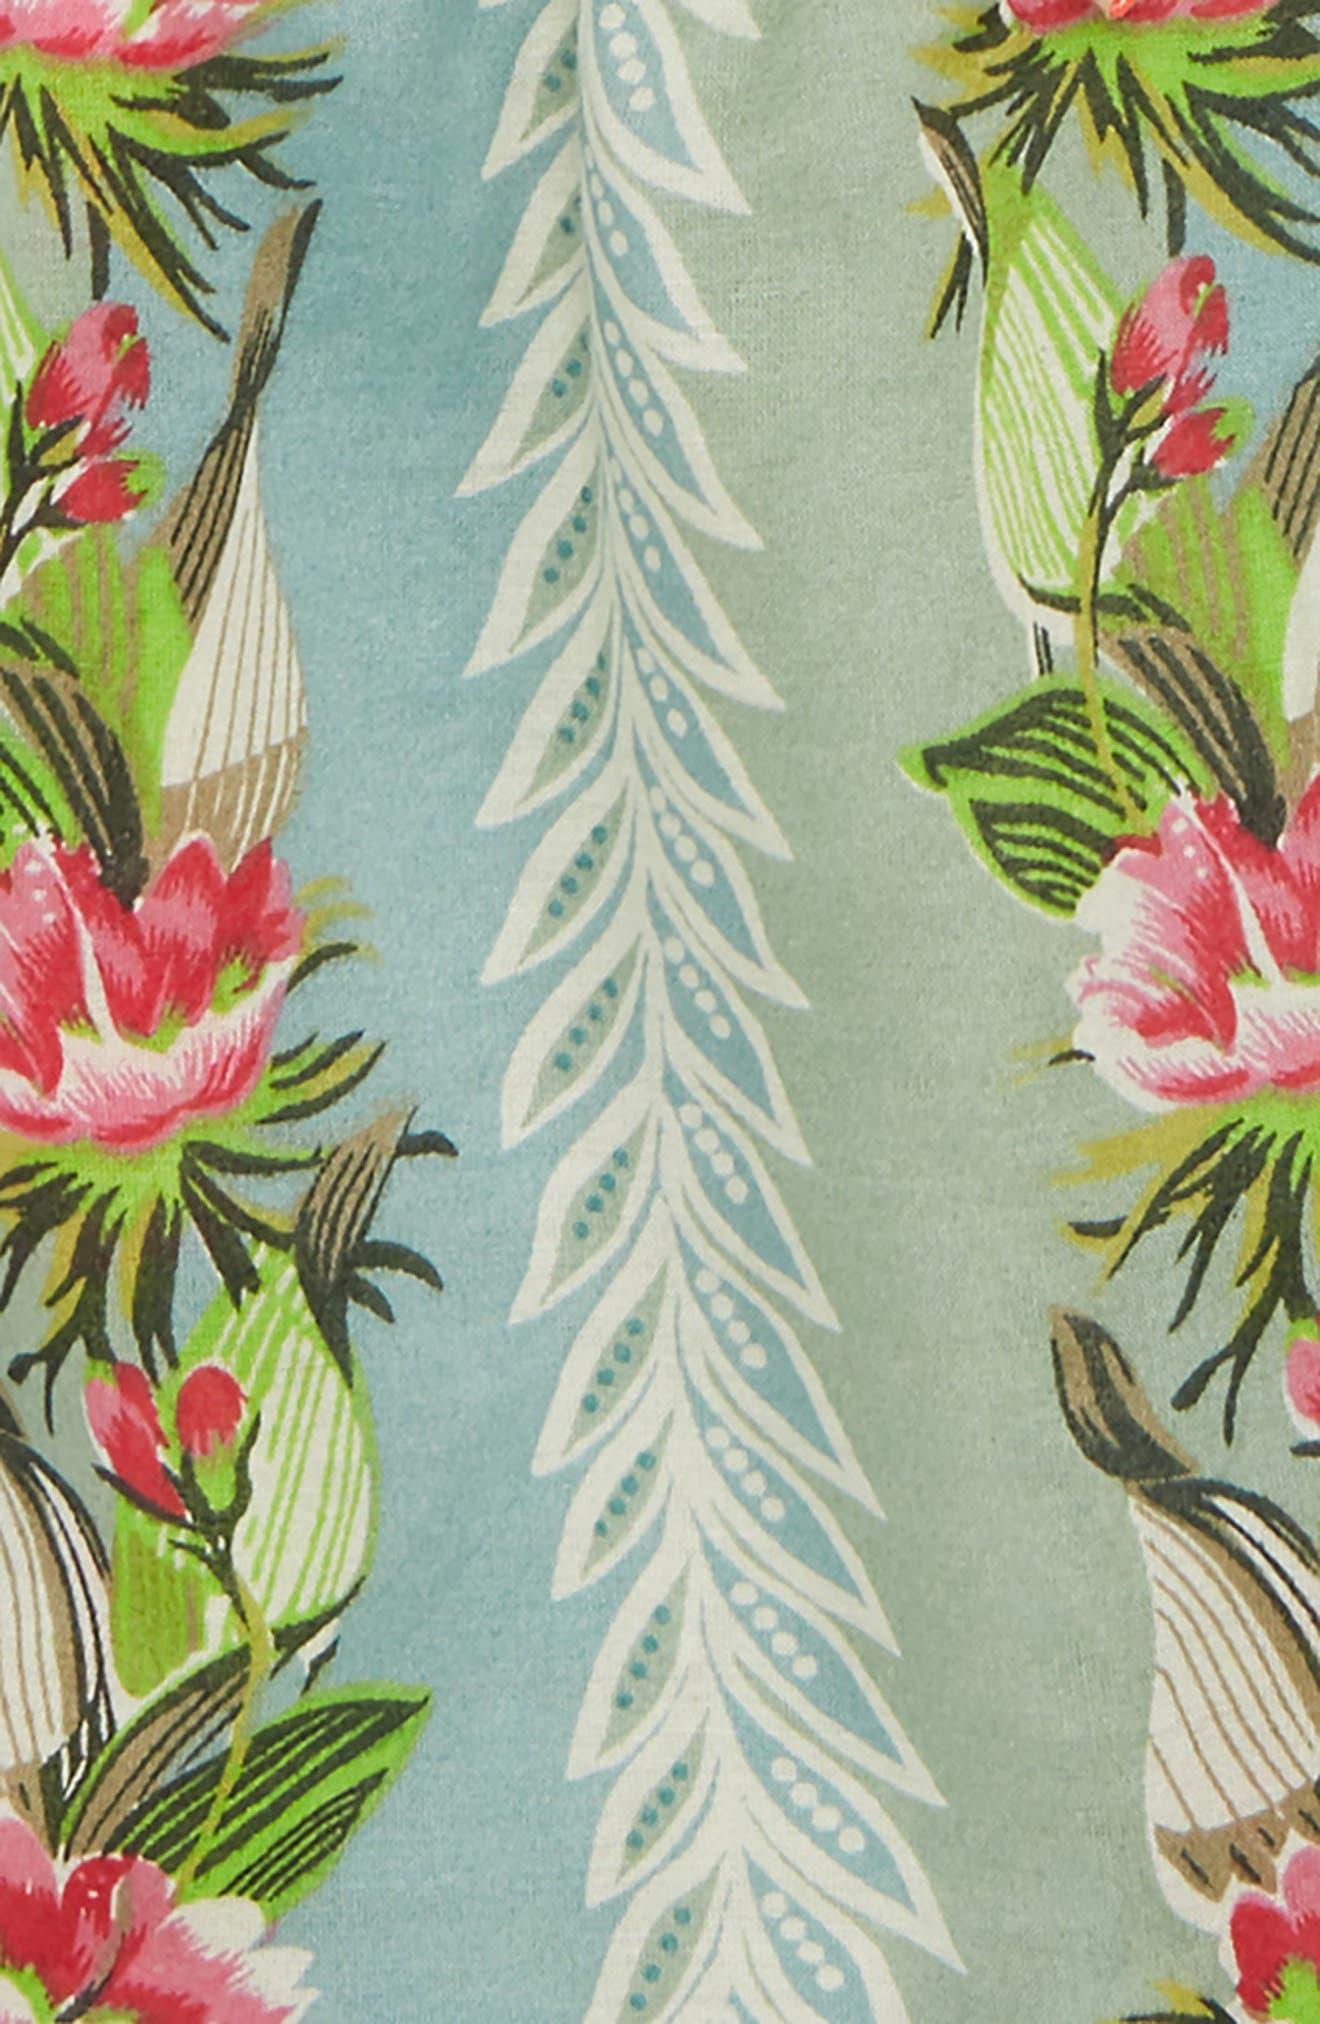 Scotch R'Belle Poolside Floral Romper,                             Alternate thumbnail 2, color,                             590 K Print